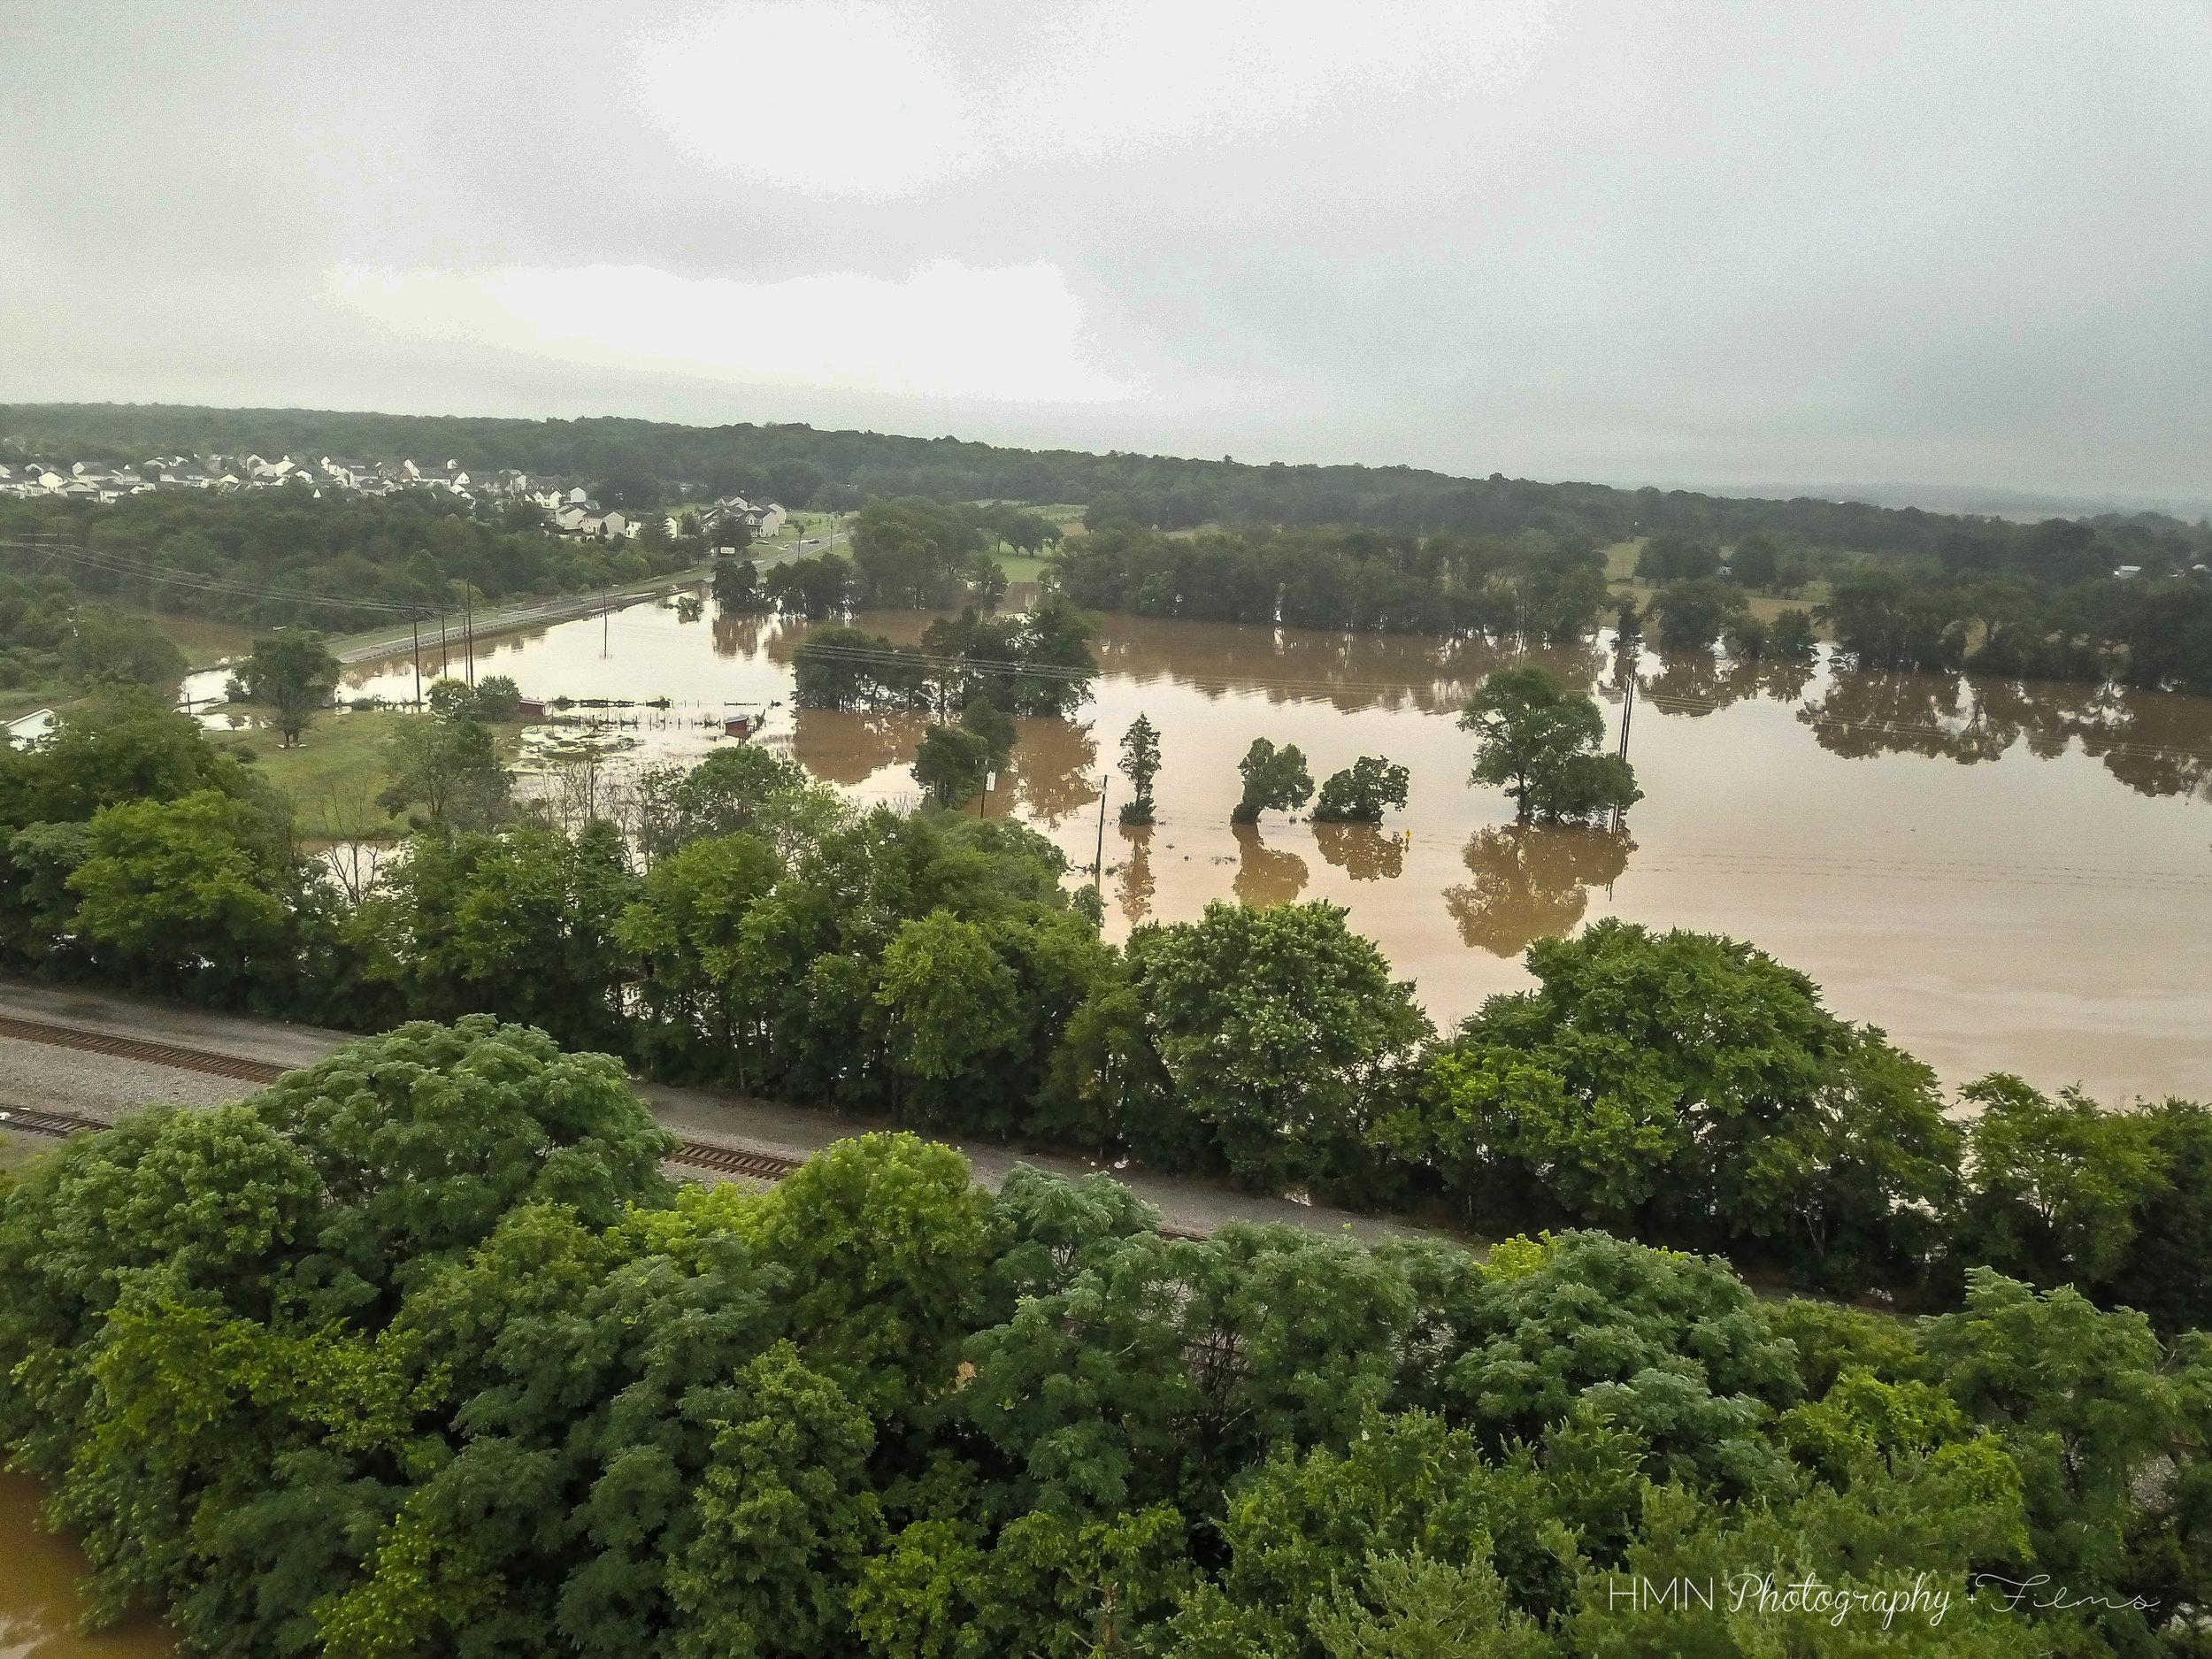 Flooding in Remington, VA June 2018